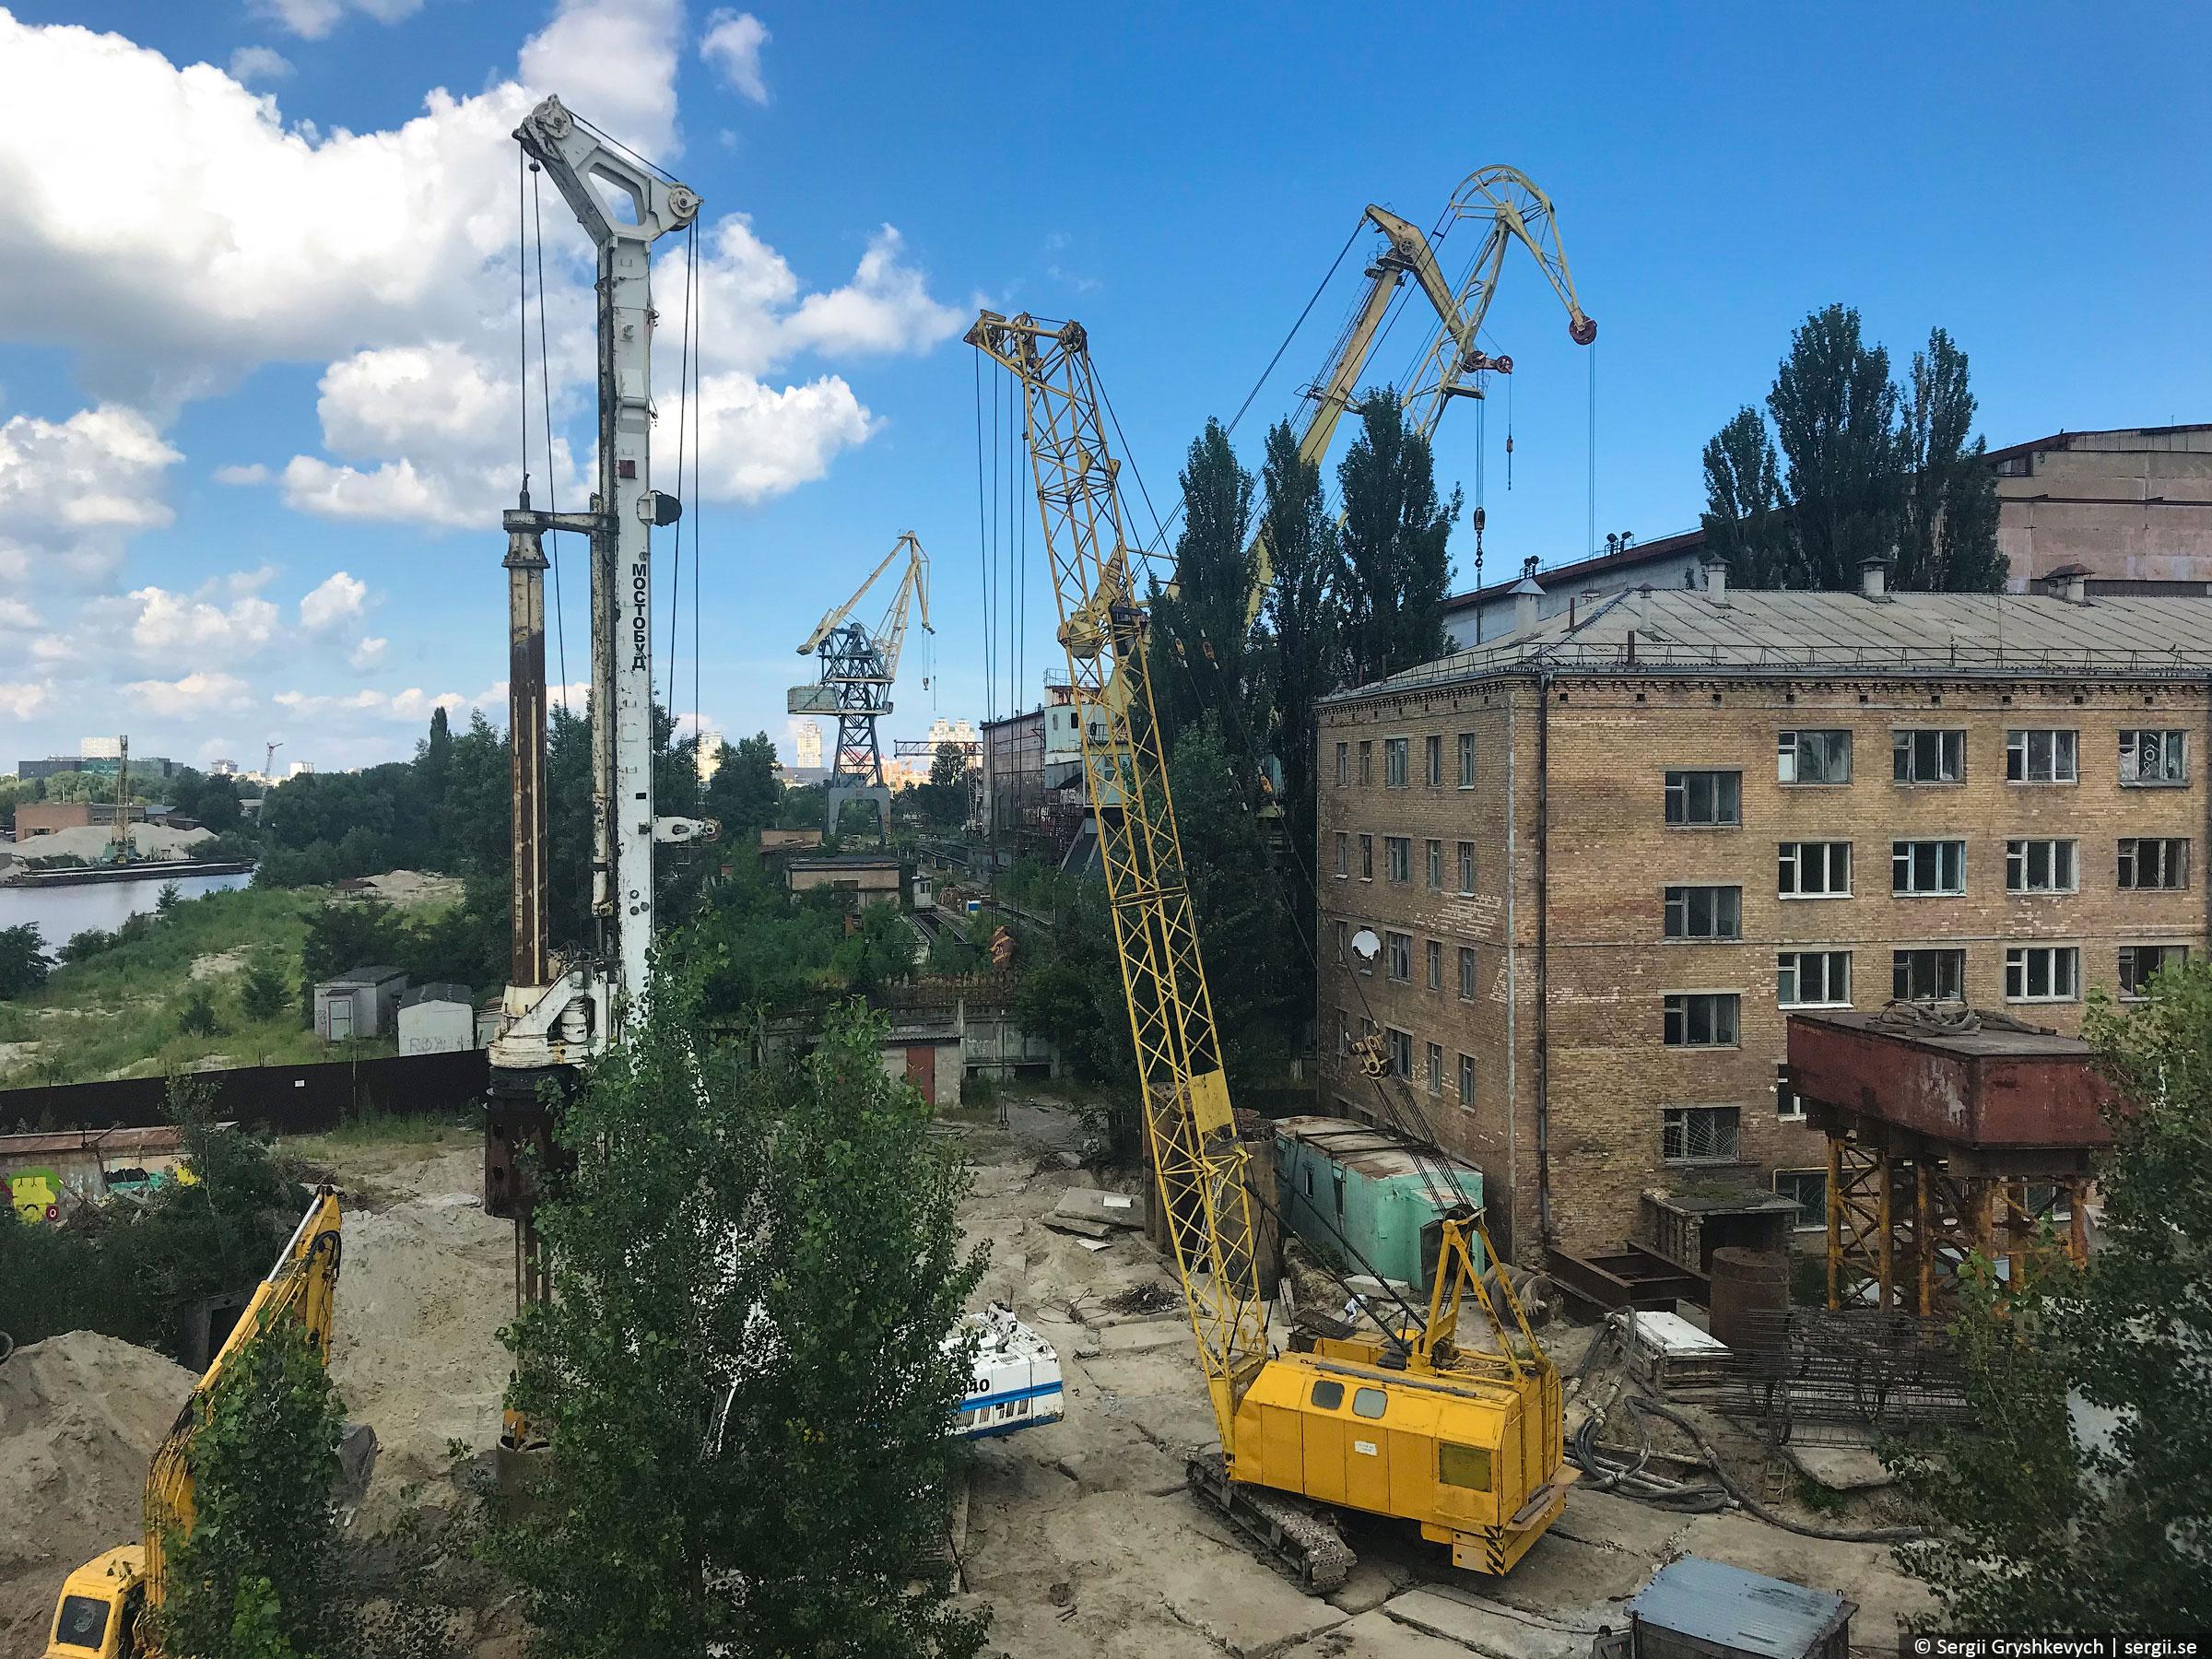 kyiv-ukraine-2018-20